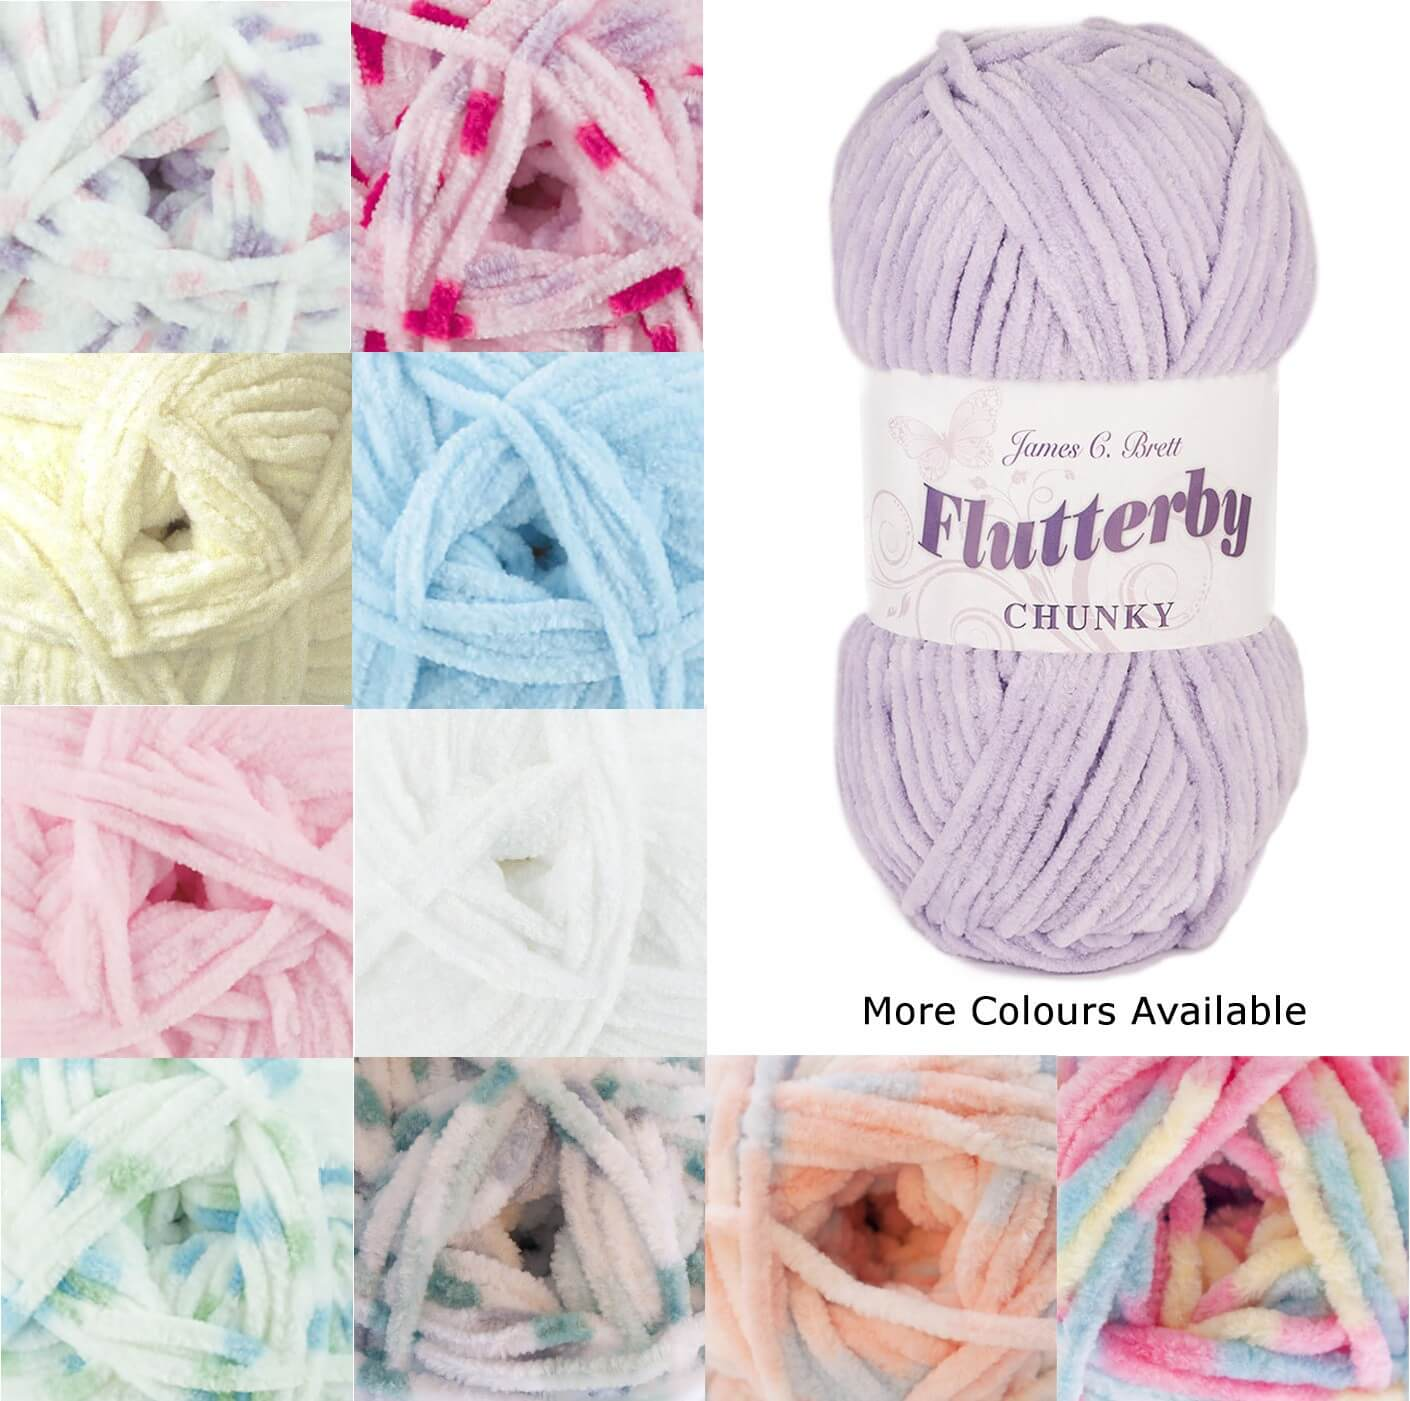 James C Brett Flutterby Chunky Yarn 100g Ball Knitting Yarn Knit Craft B2